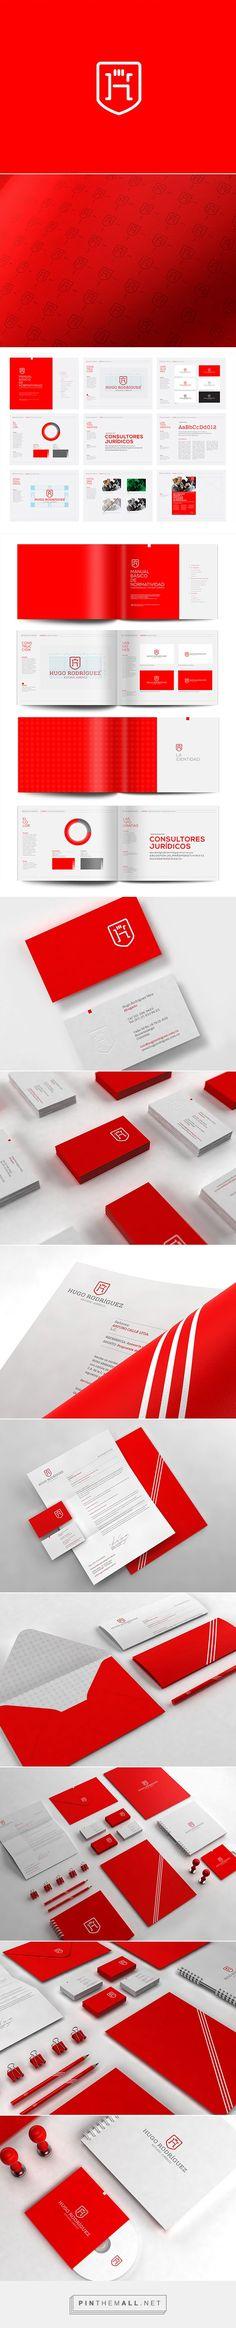 HR Hugo Rodríguez - Logo and Identity